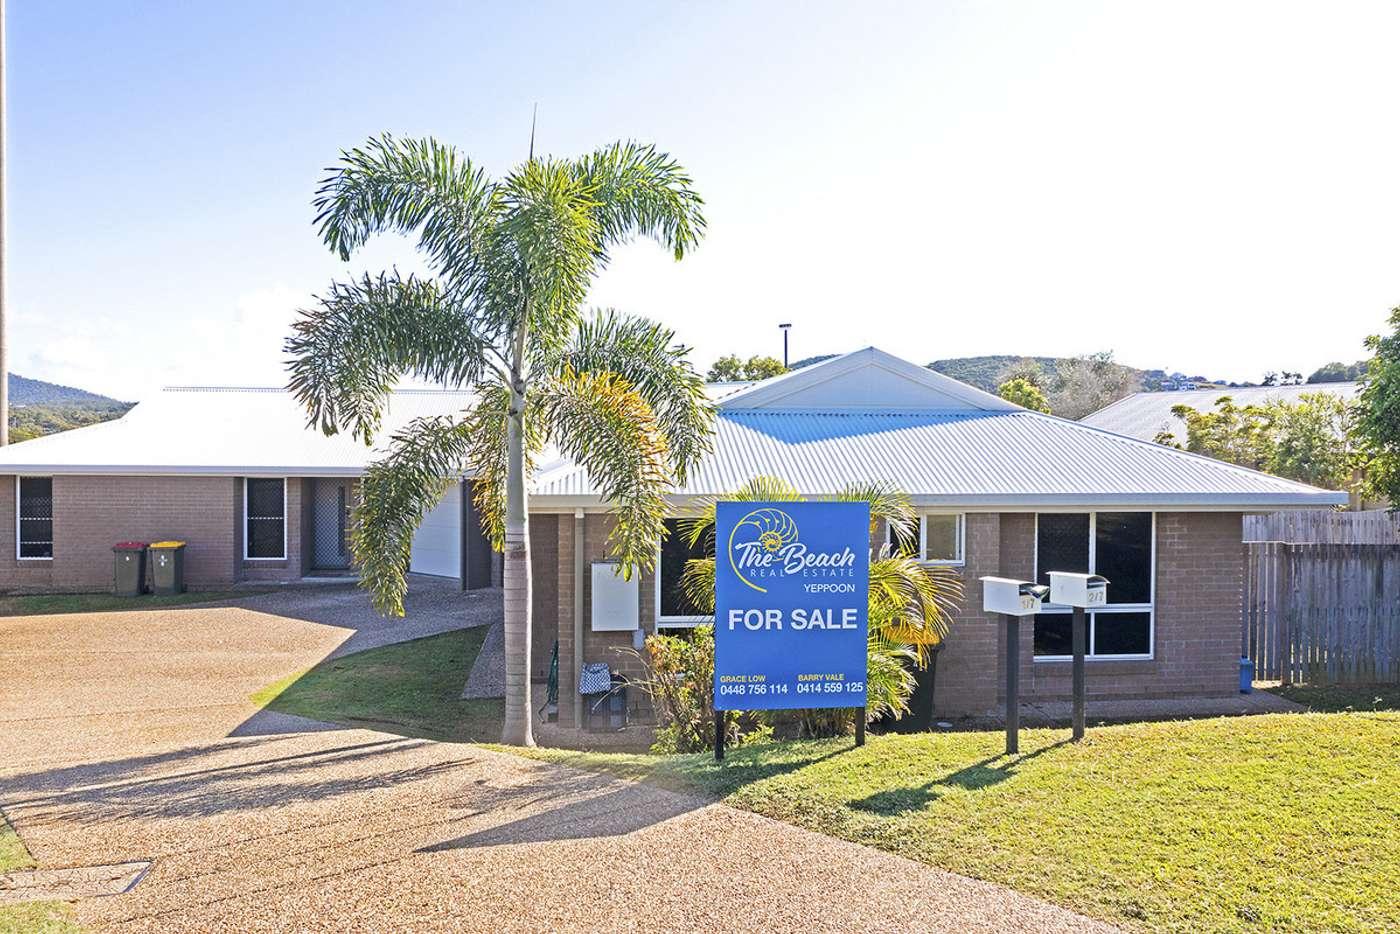 Main view of Homely semiDetached listing, 1 & 2/7 Johnathon Street, Yeppoon QLD 4703